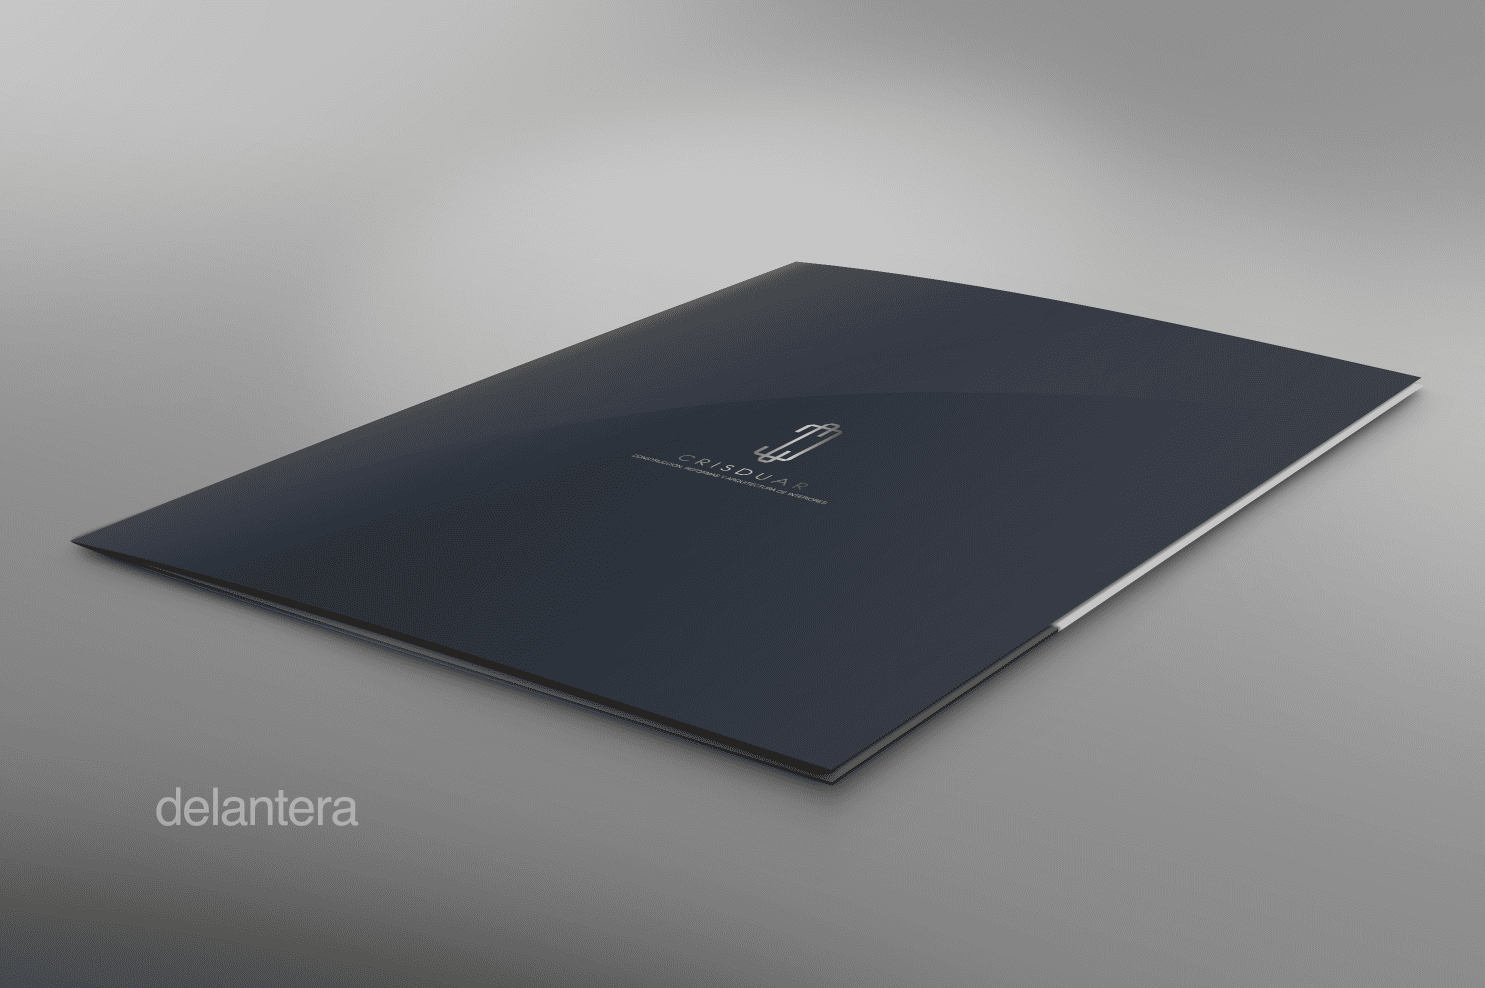 diseño de carpeta corporativa para empresa de construccion